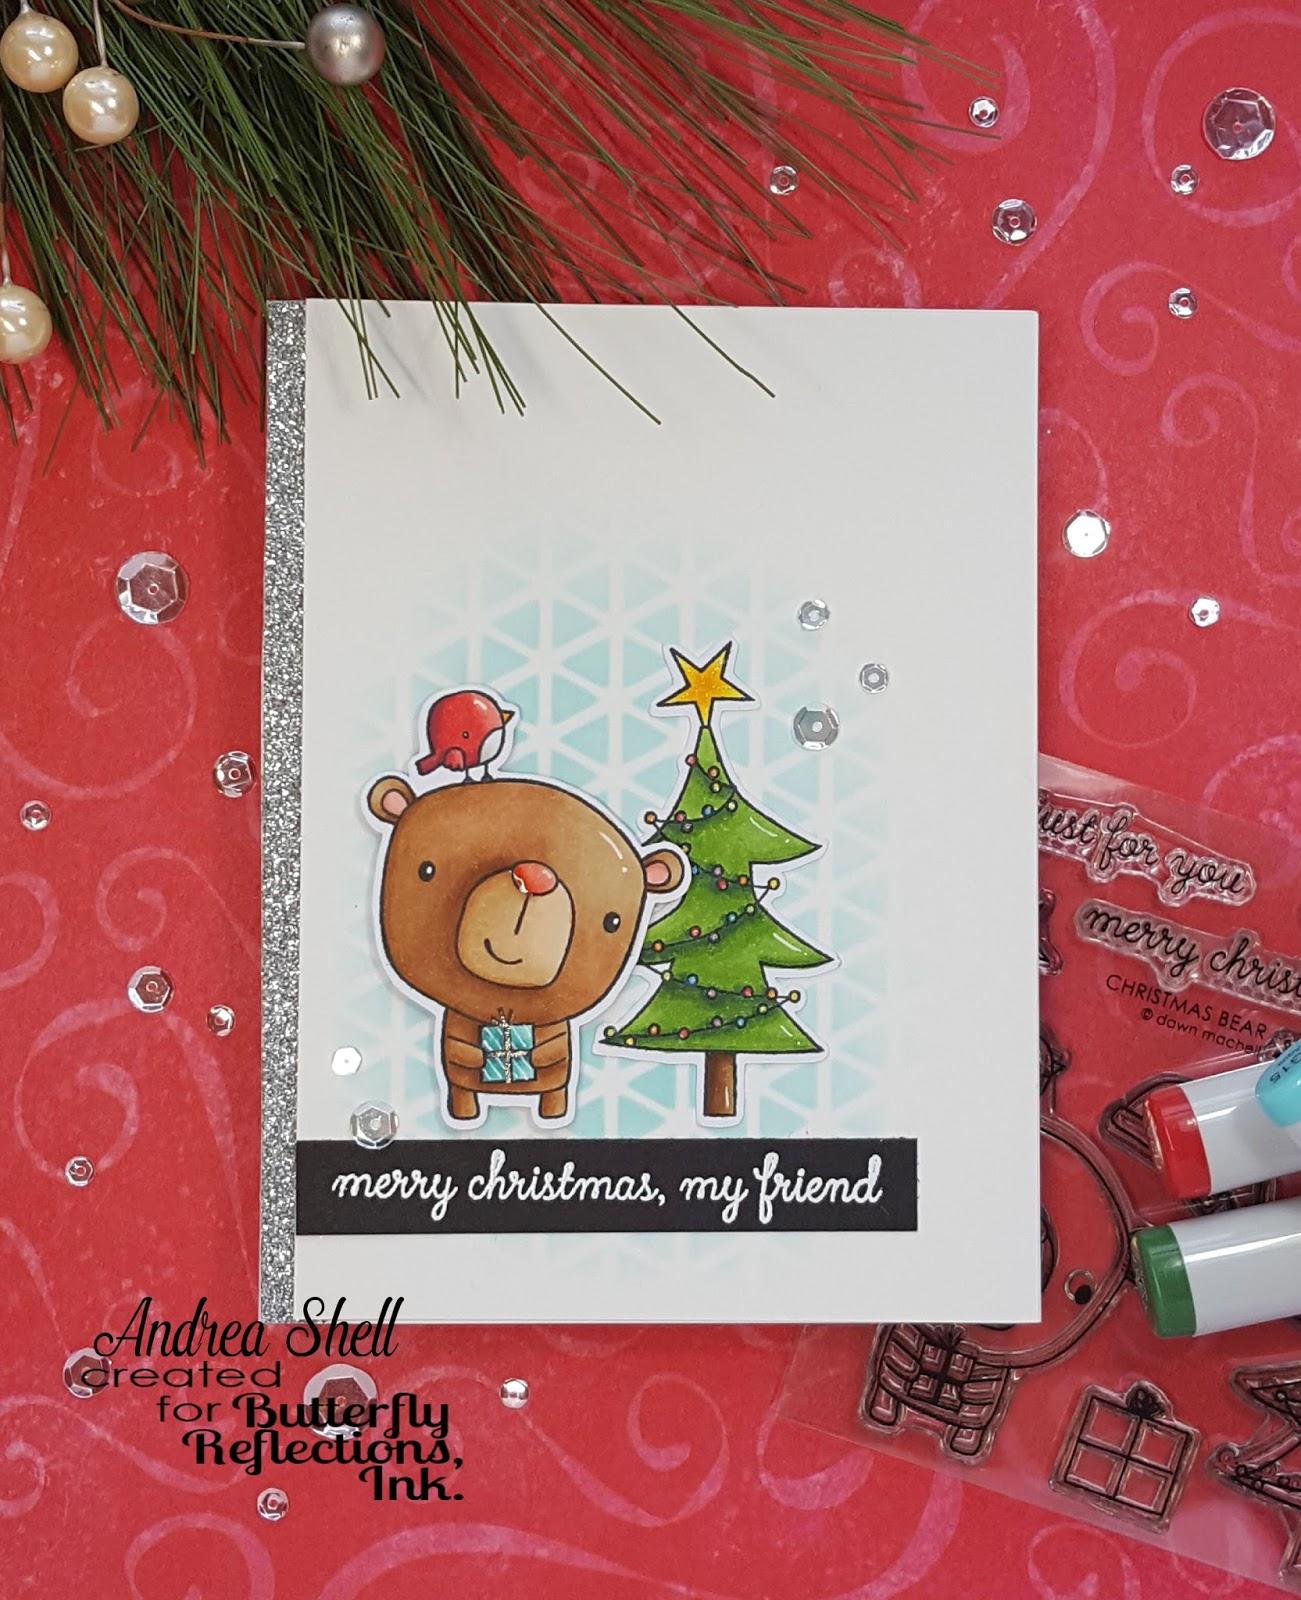 Merry Christmas My Friend.Merry Christmas My Friend